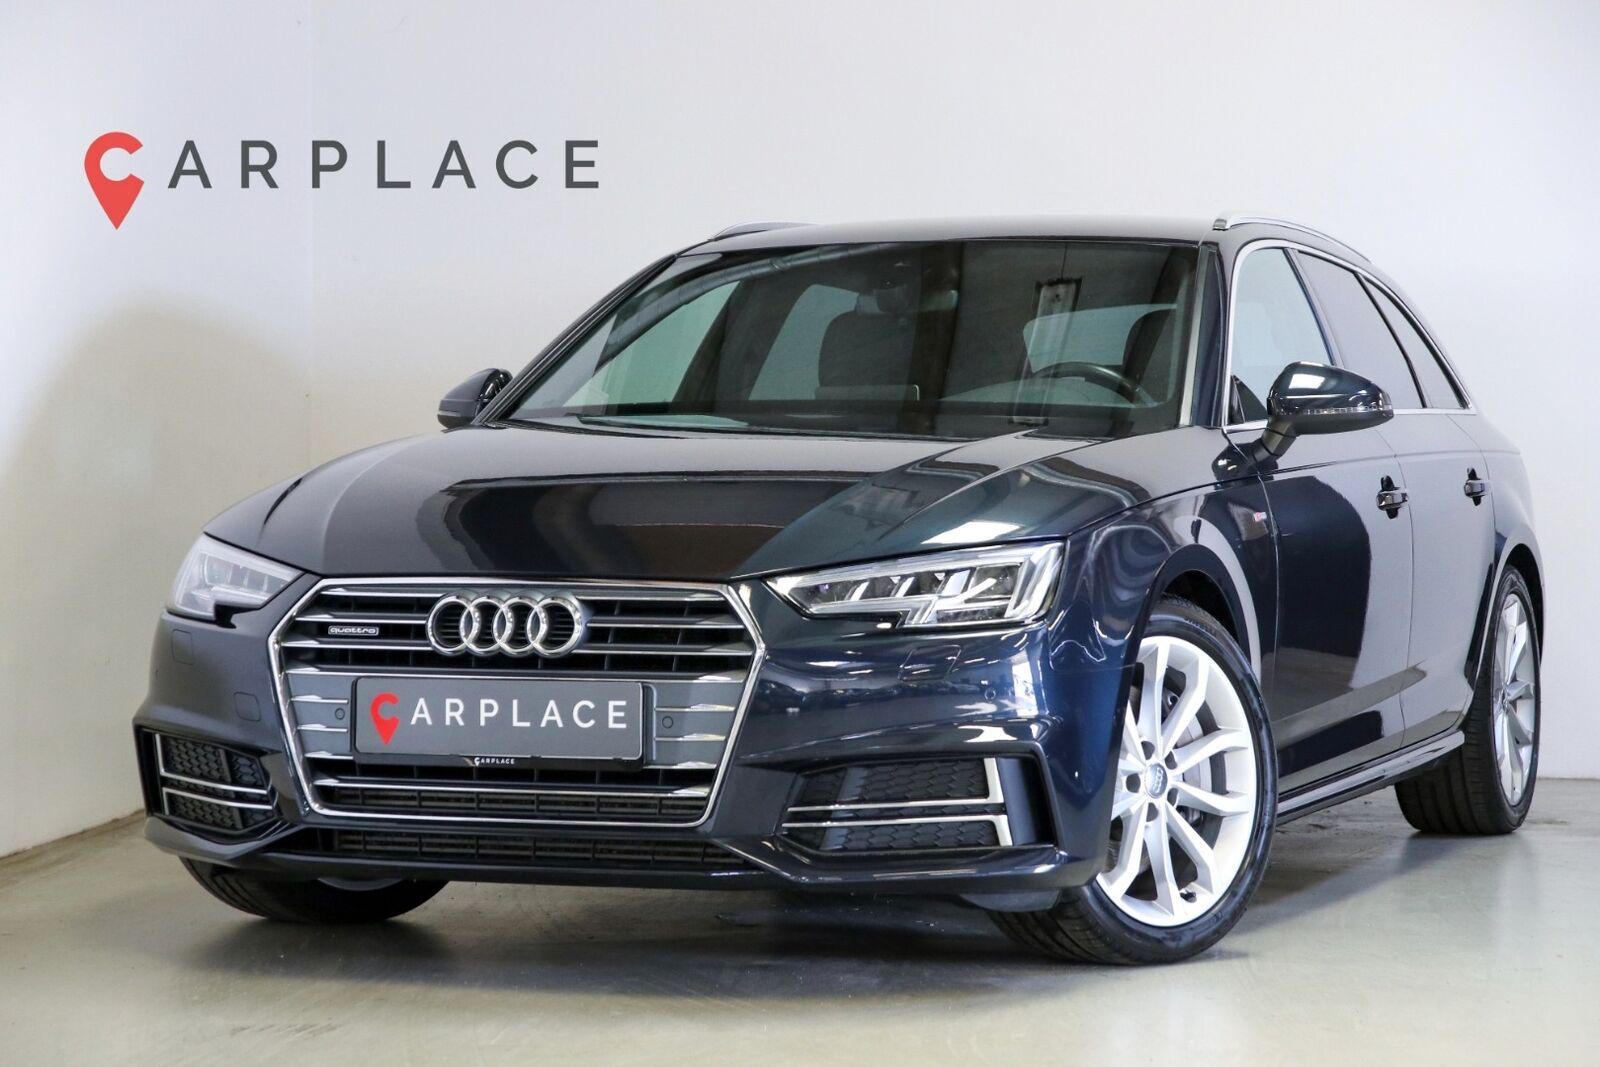 Audi A4 3,0 TDi 272 S-line Avant quat. Tip 5d - 499.900 kr.